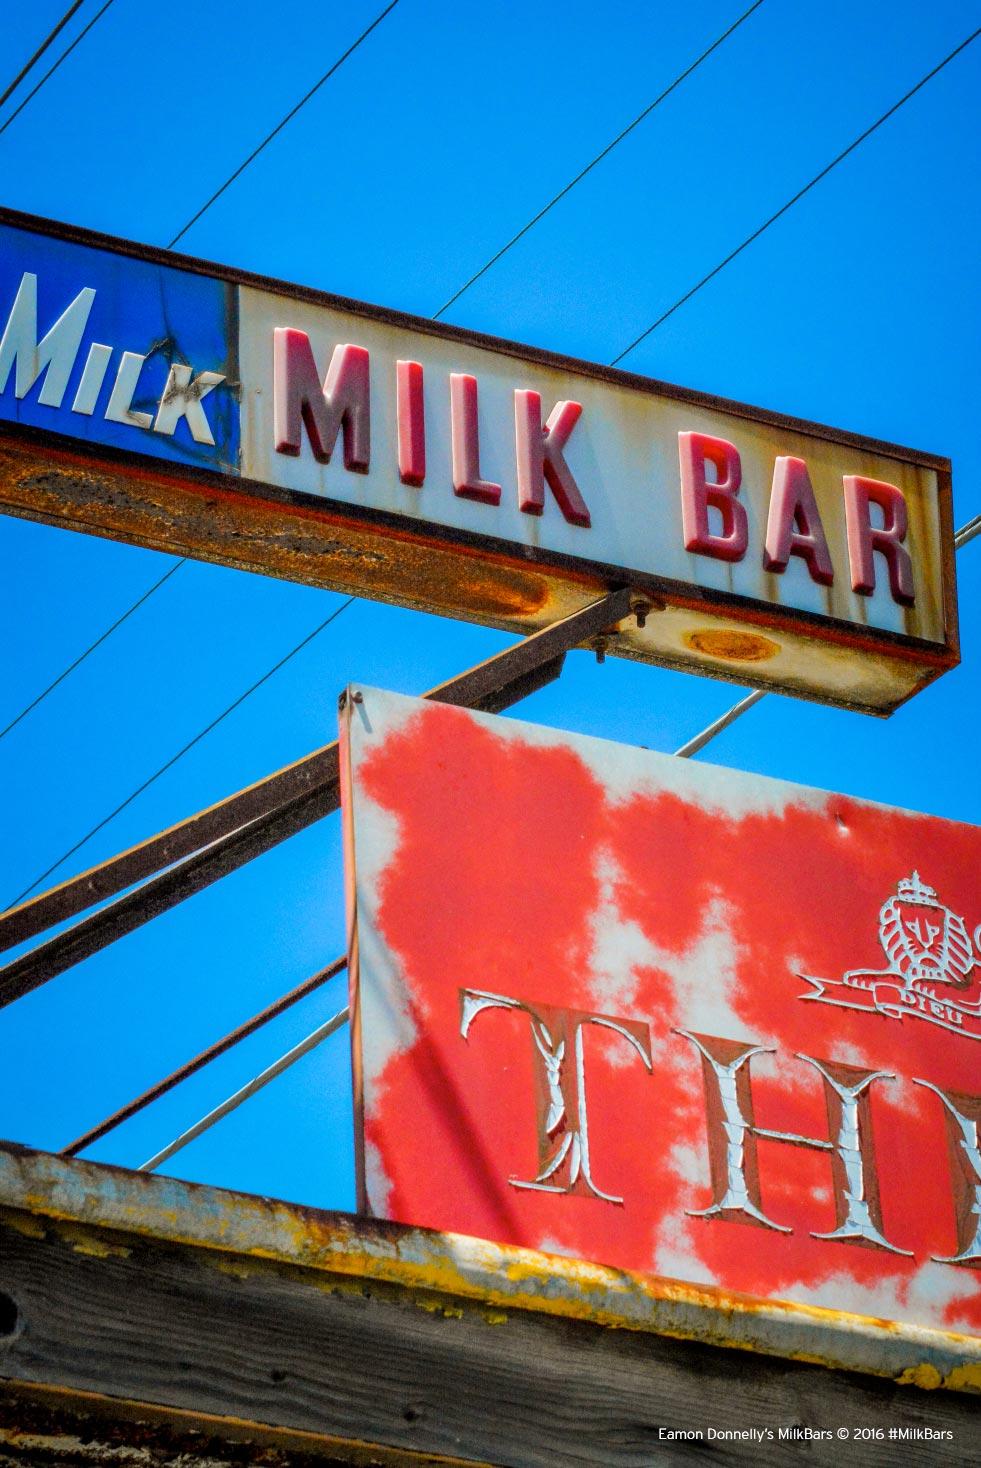 Richards-Milk-Bar-2-Eamon-Donnelly's-Milk-Bars-Book-Project-(c)-2001-2016.jpg